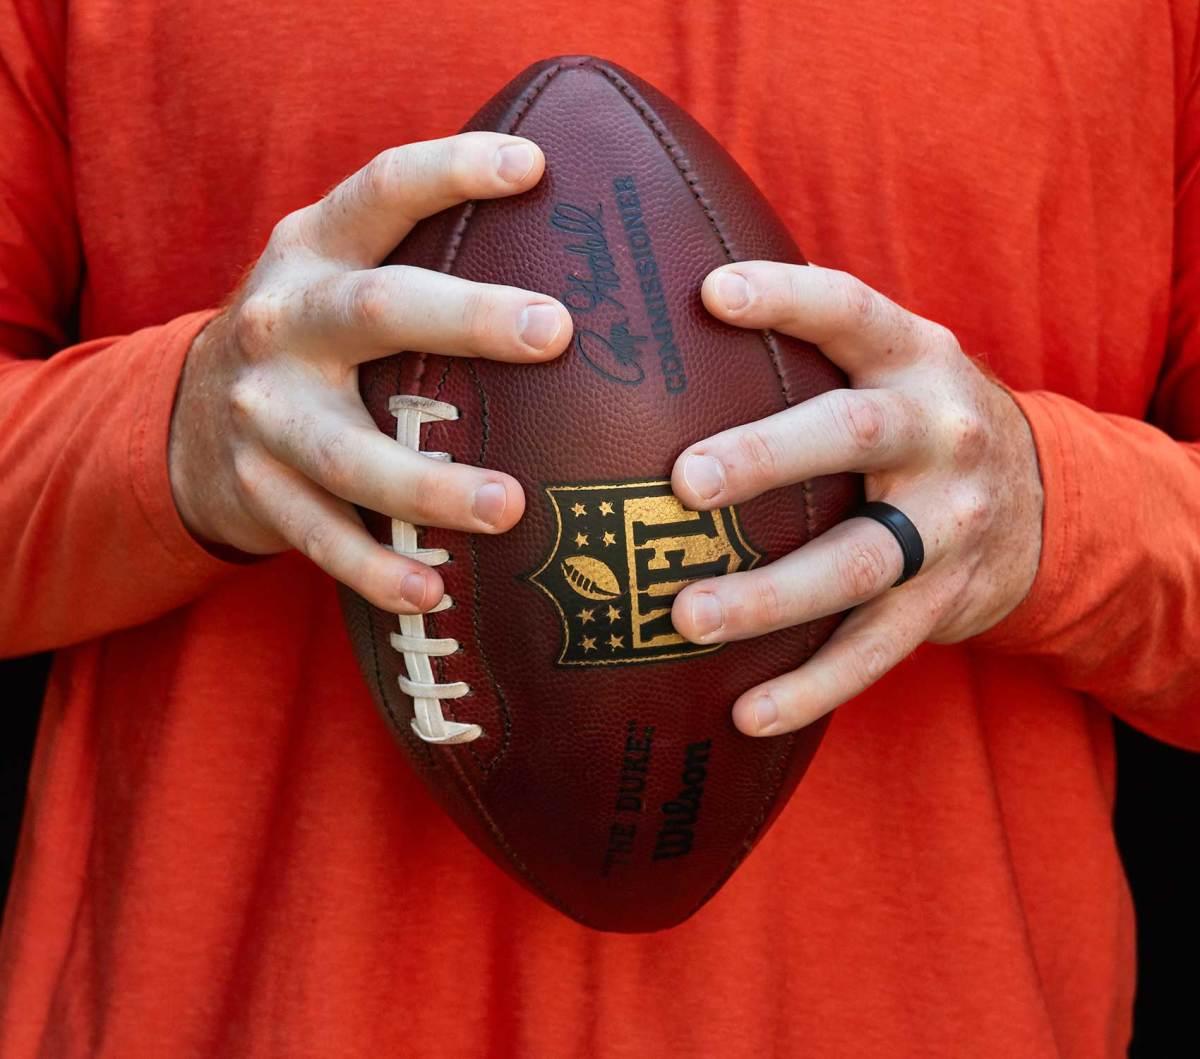 holding-football.jpg